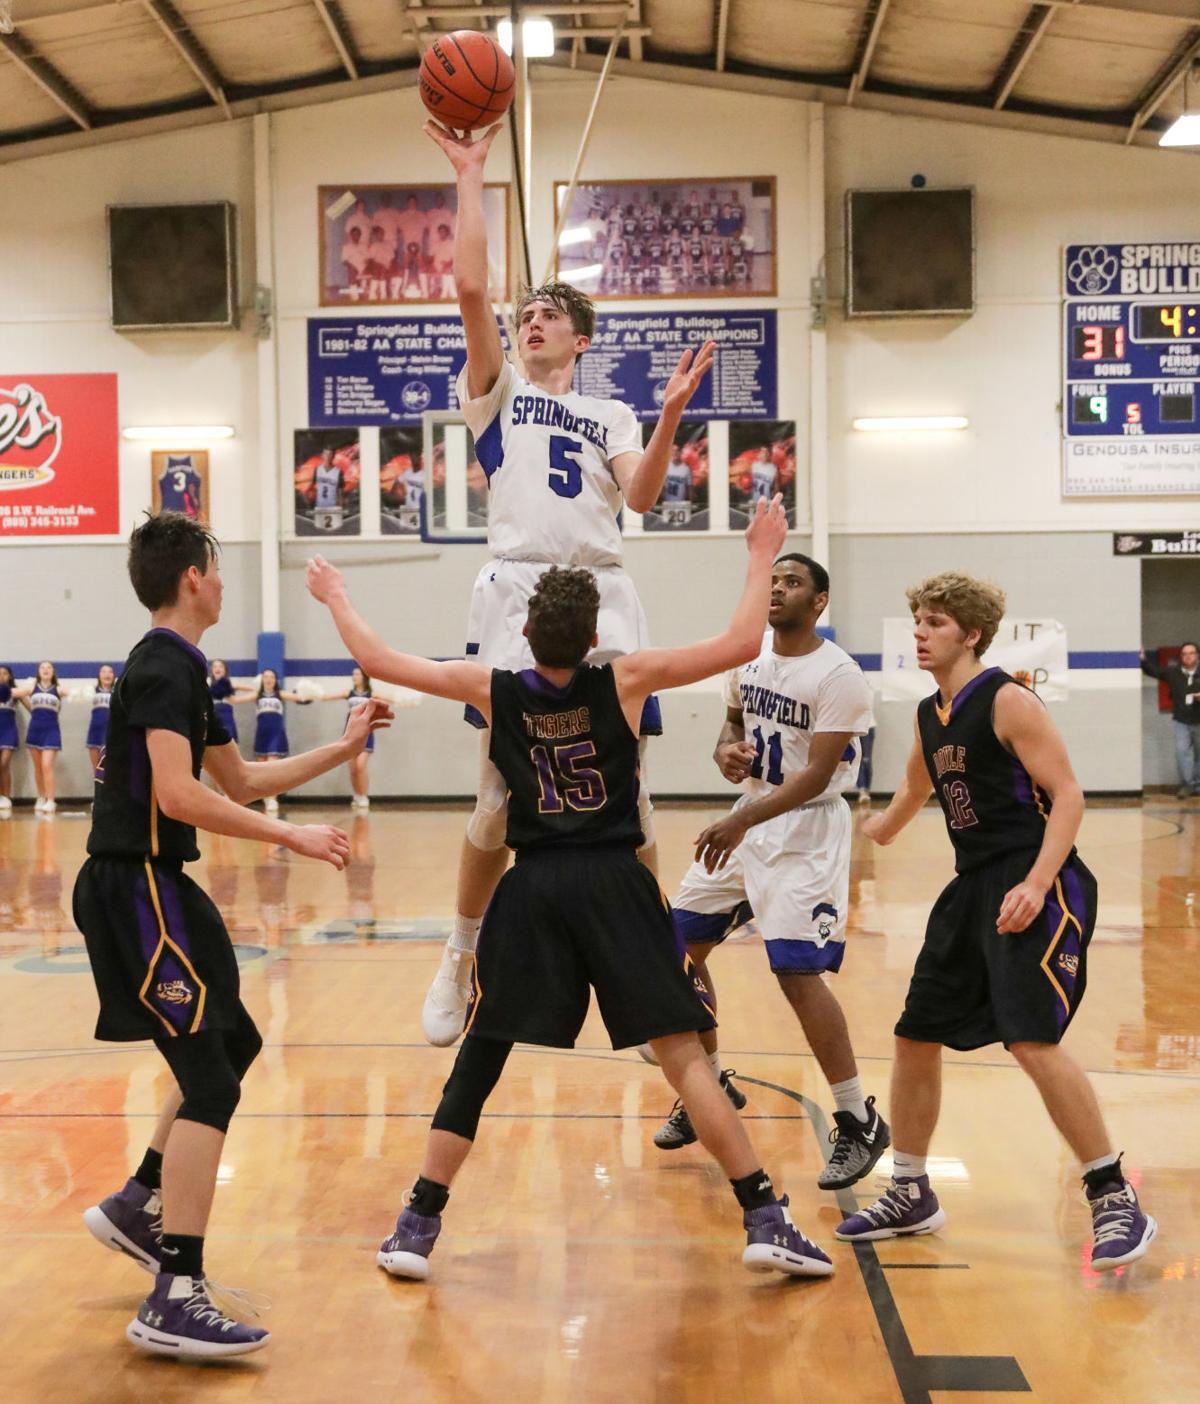 Doyle at Springsfield boys basketball Collin Hayden Landon Wolfe